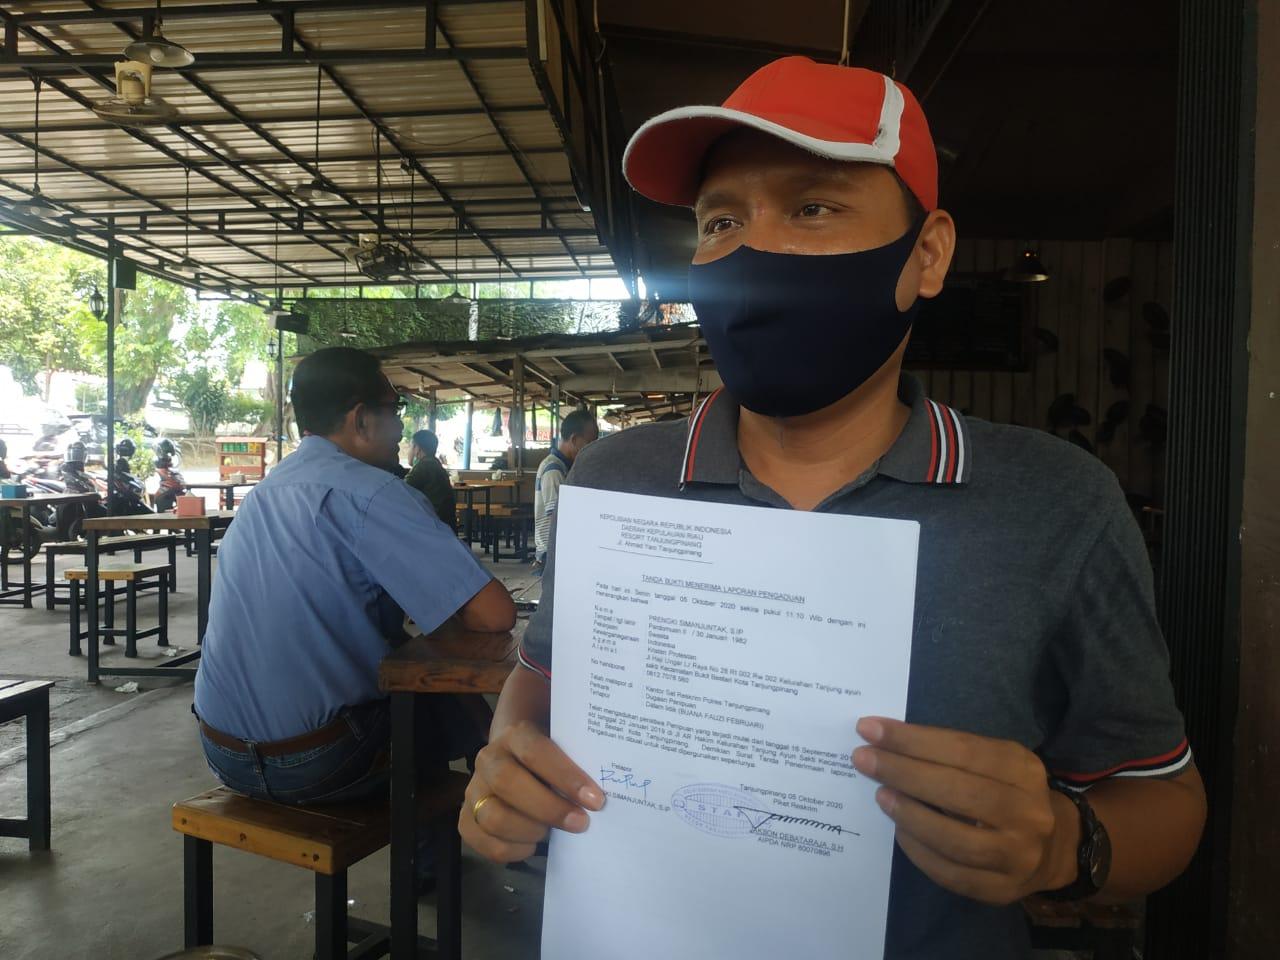 Oknum PNS Dilaporkan Ke Polres Tanjungpinang